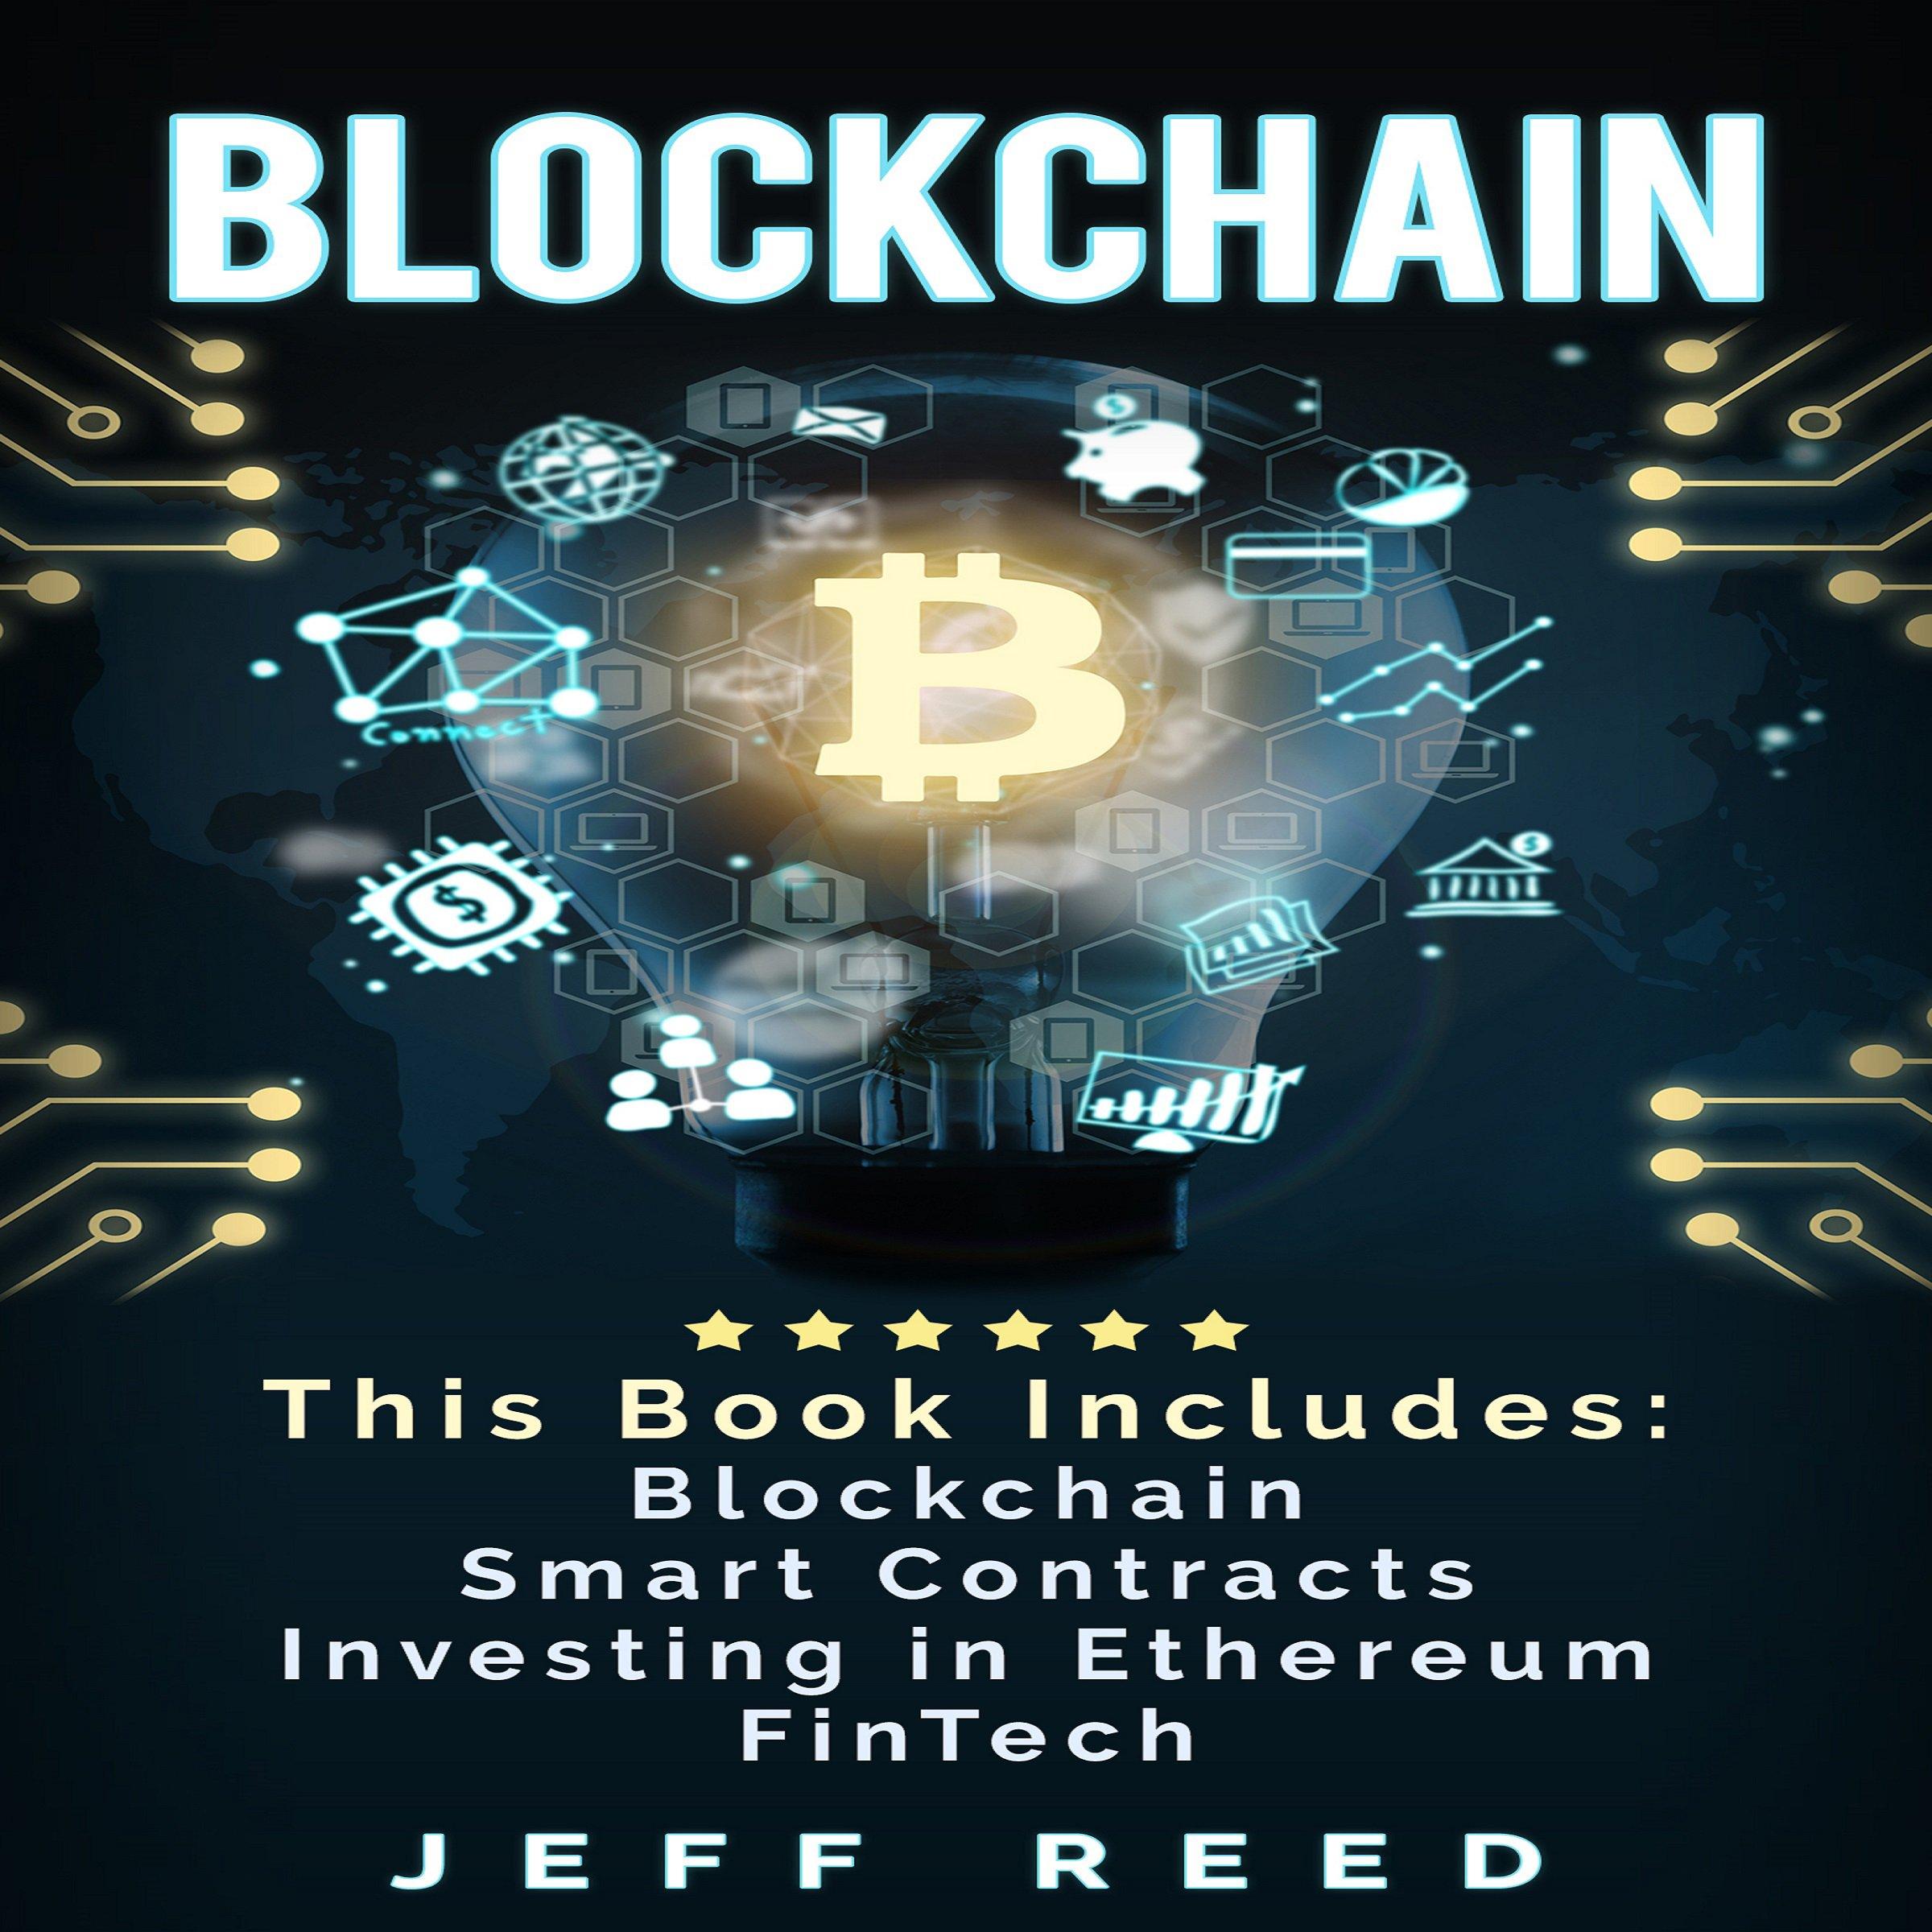 Blockchain: 4-in-1 Bundle: Blockchain, Smart Contracts, Investing in Ethereum, FinTech